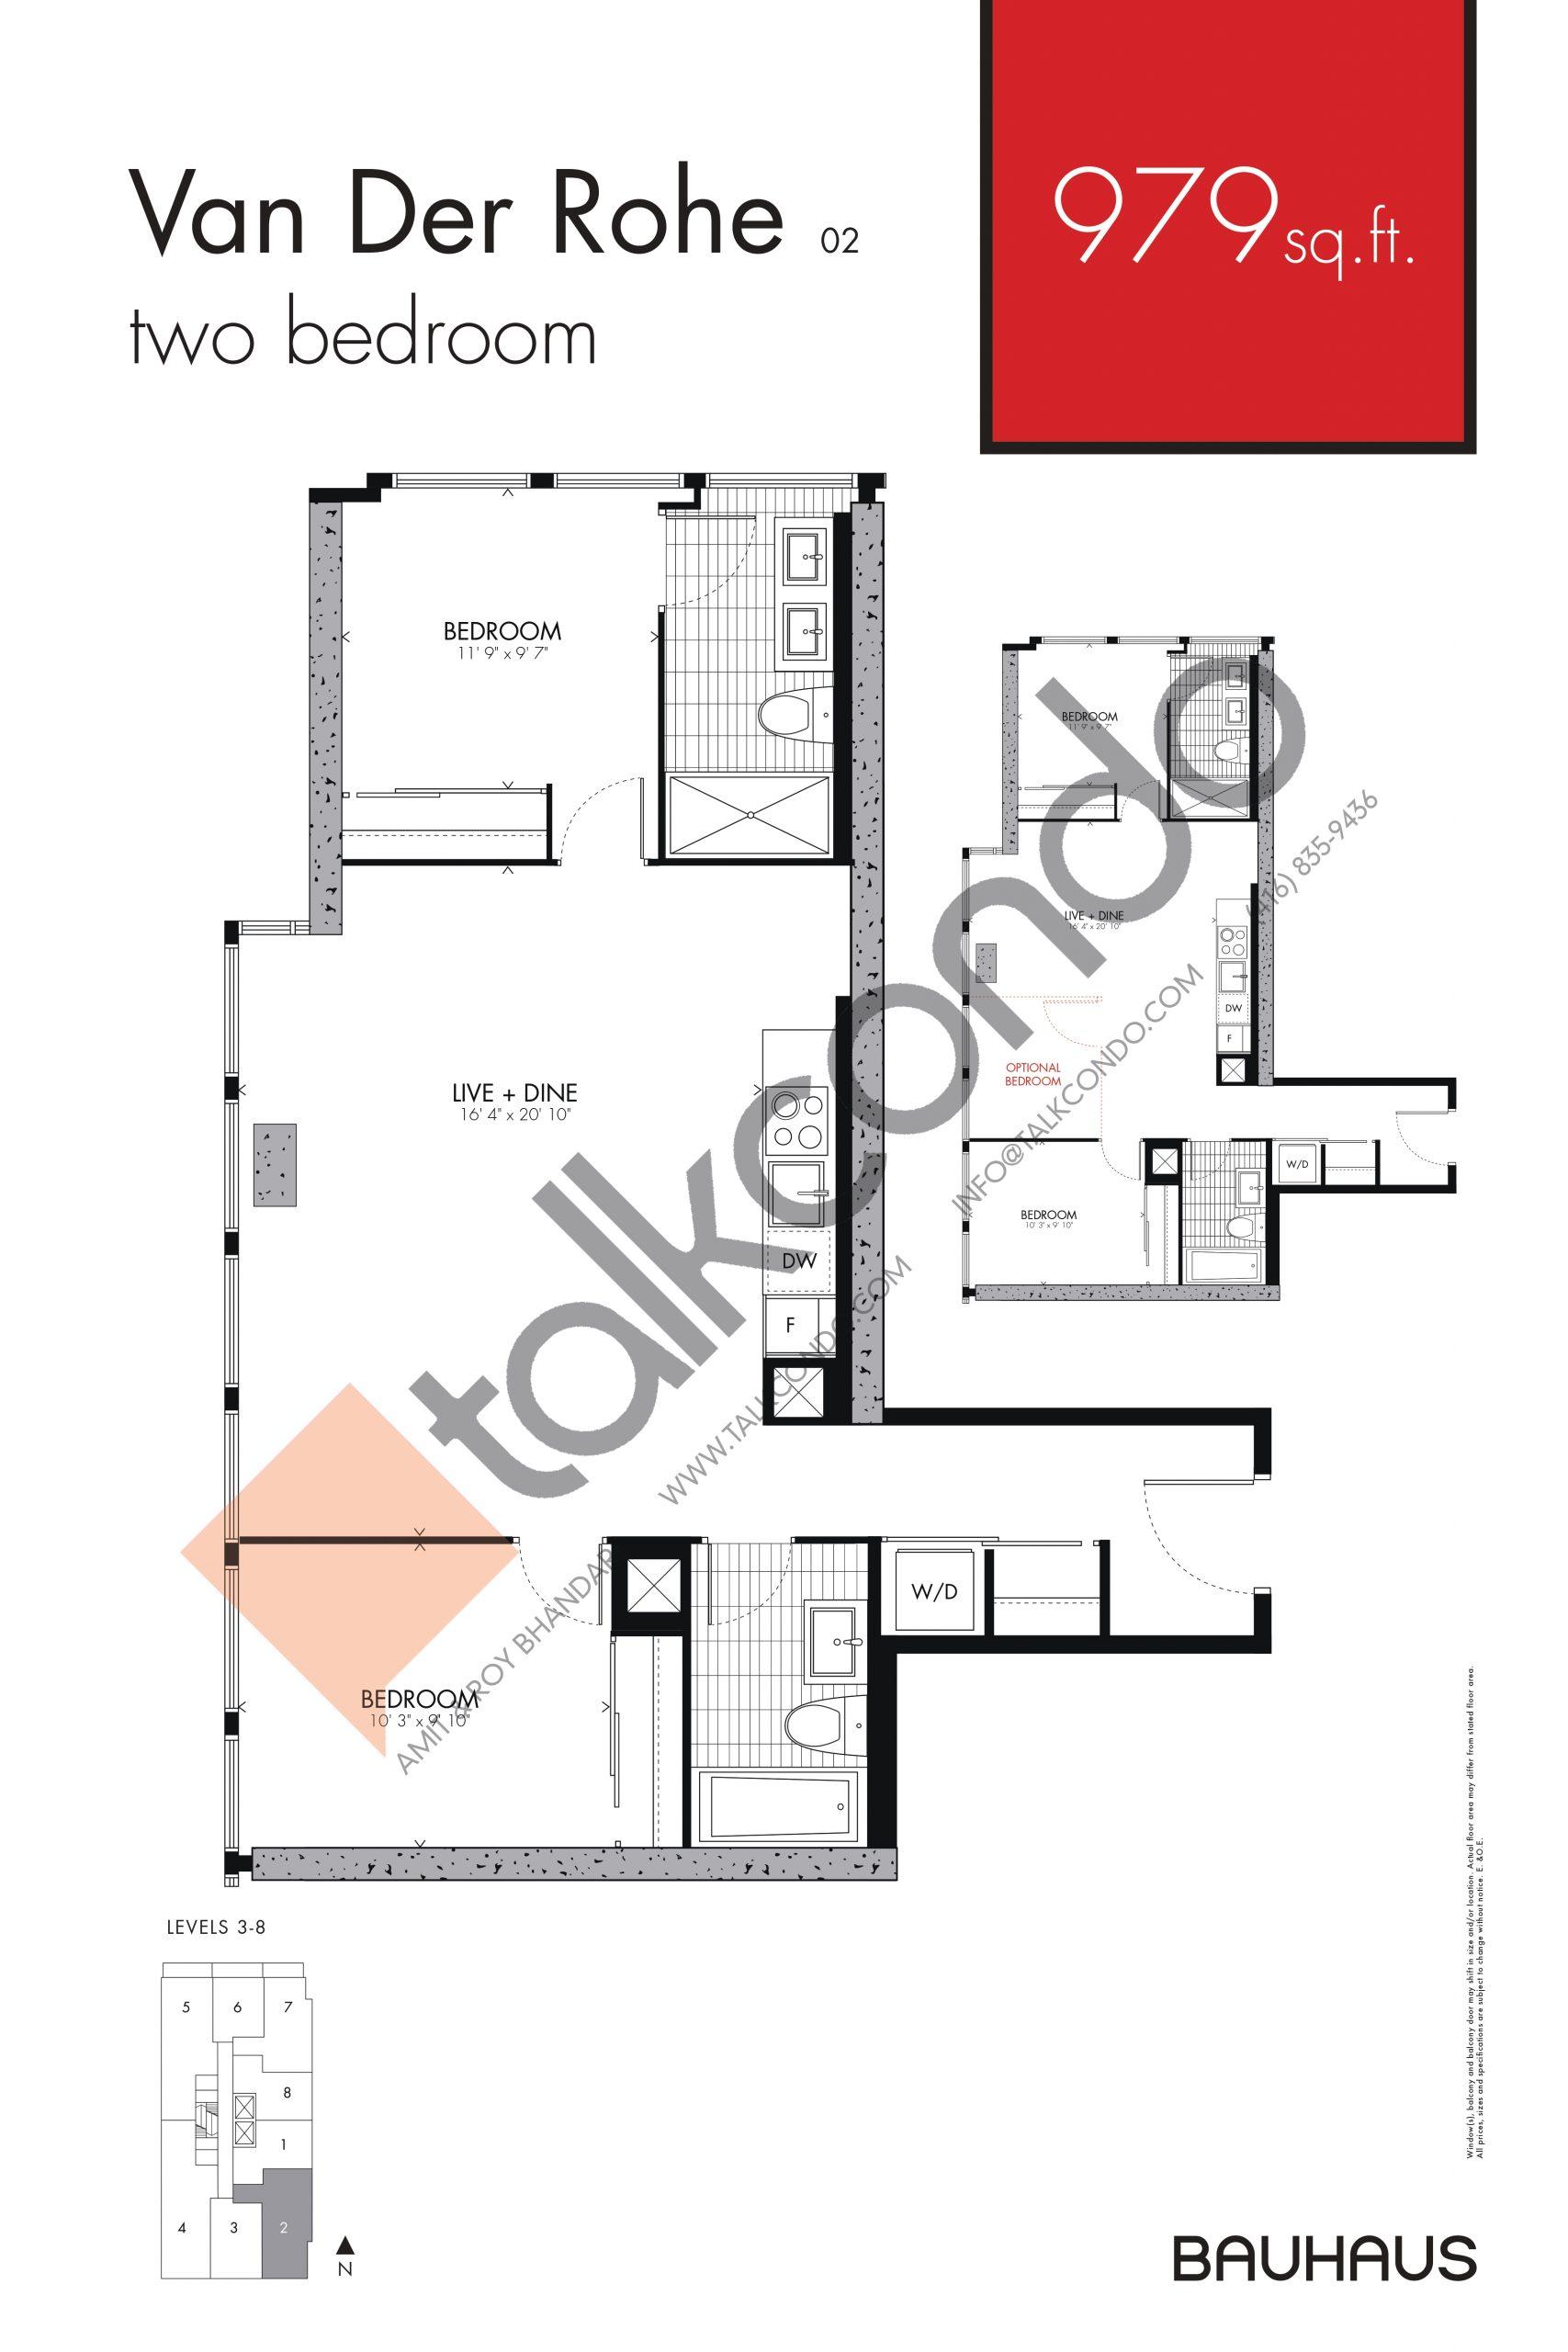 Van Der Rohe Floor Plan at Bauhaus Condos - 979 sq.ft